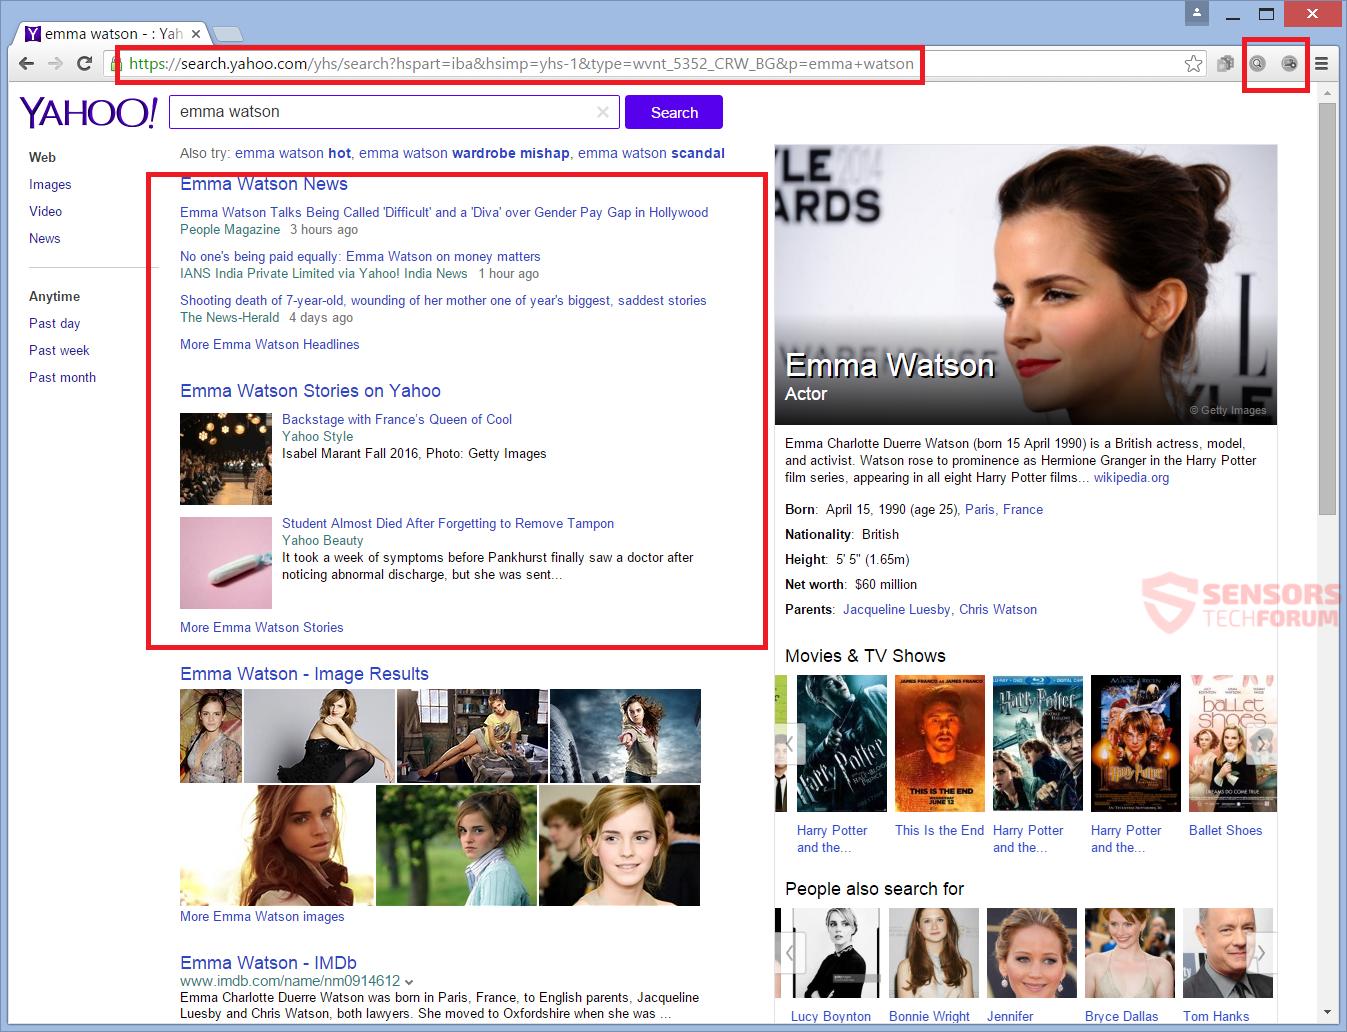 STF-wowmovix-gomovix-com-wow-movix-searchalgo-com-search-algo-emma-watson-search-results